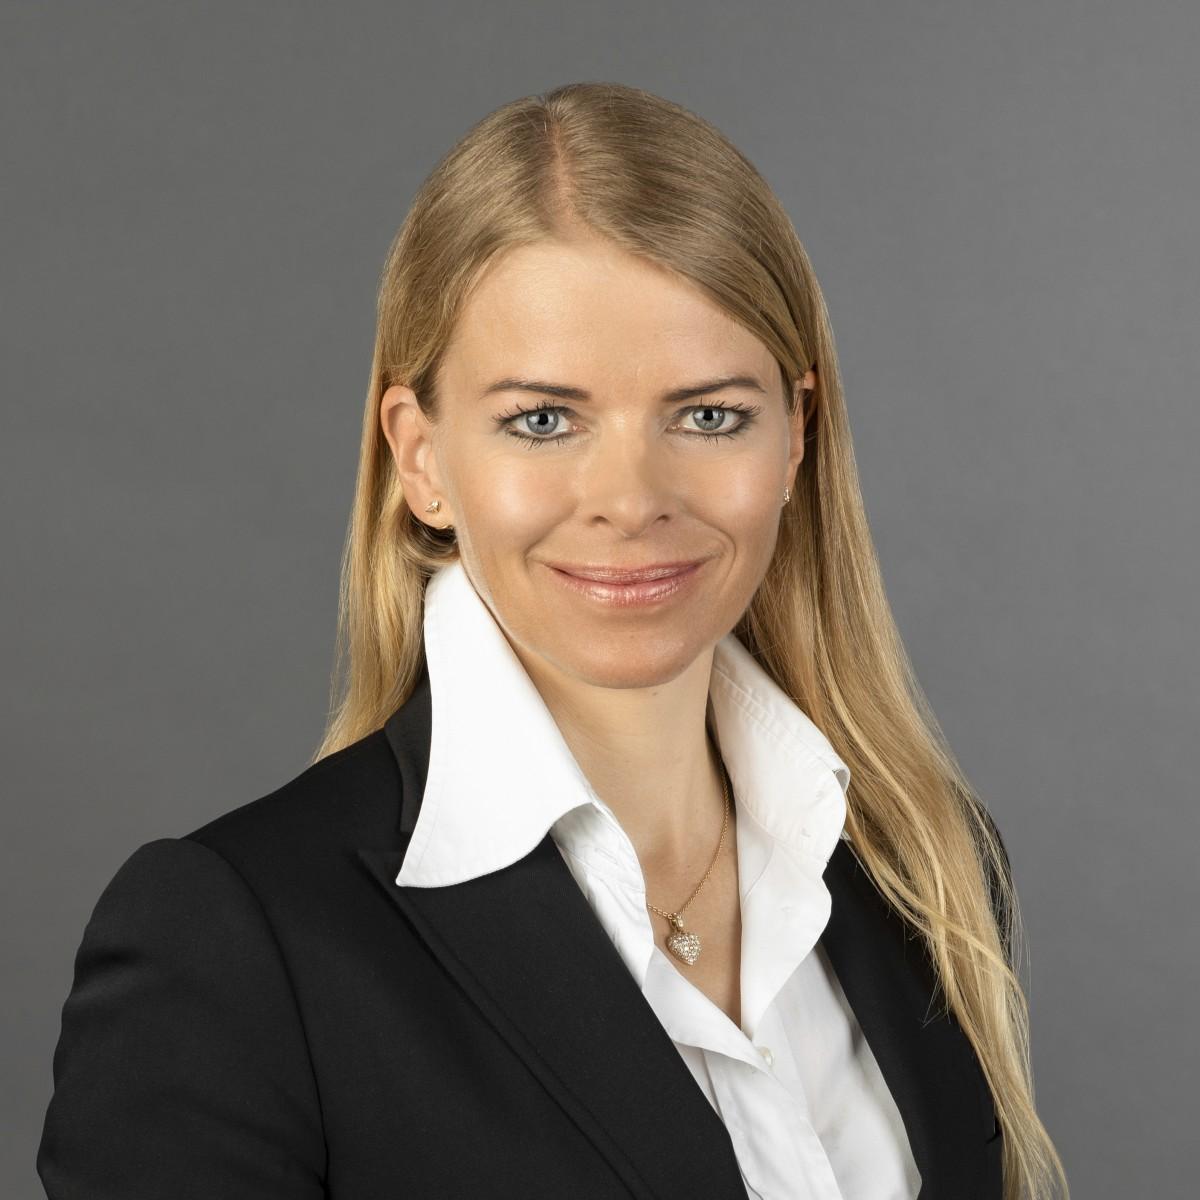 Stephanie Bossart